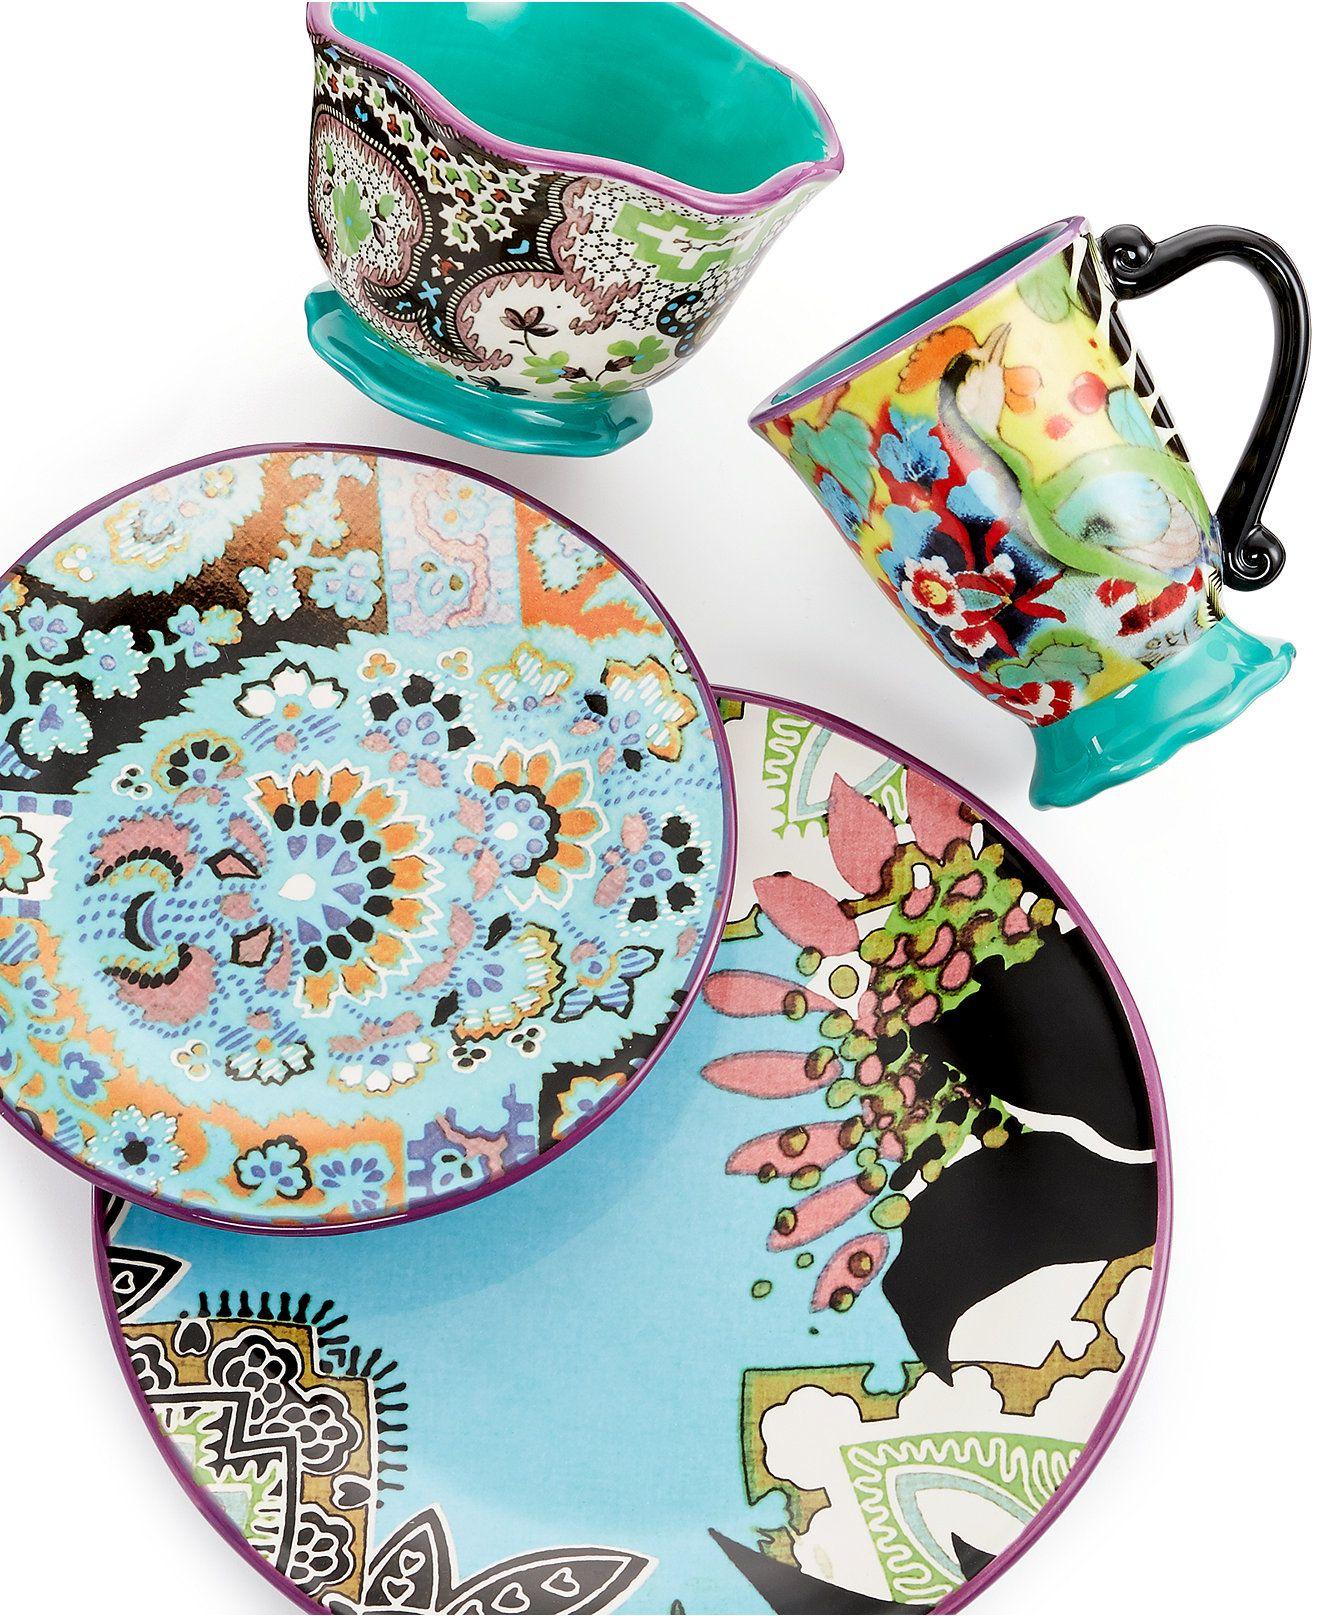 Tracy Porter Rose Boheme Dinnerware Collection | Dinnerware, House ...